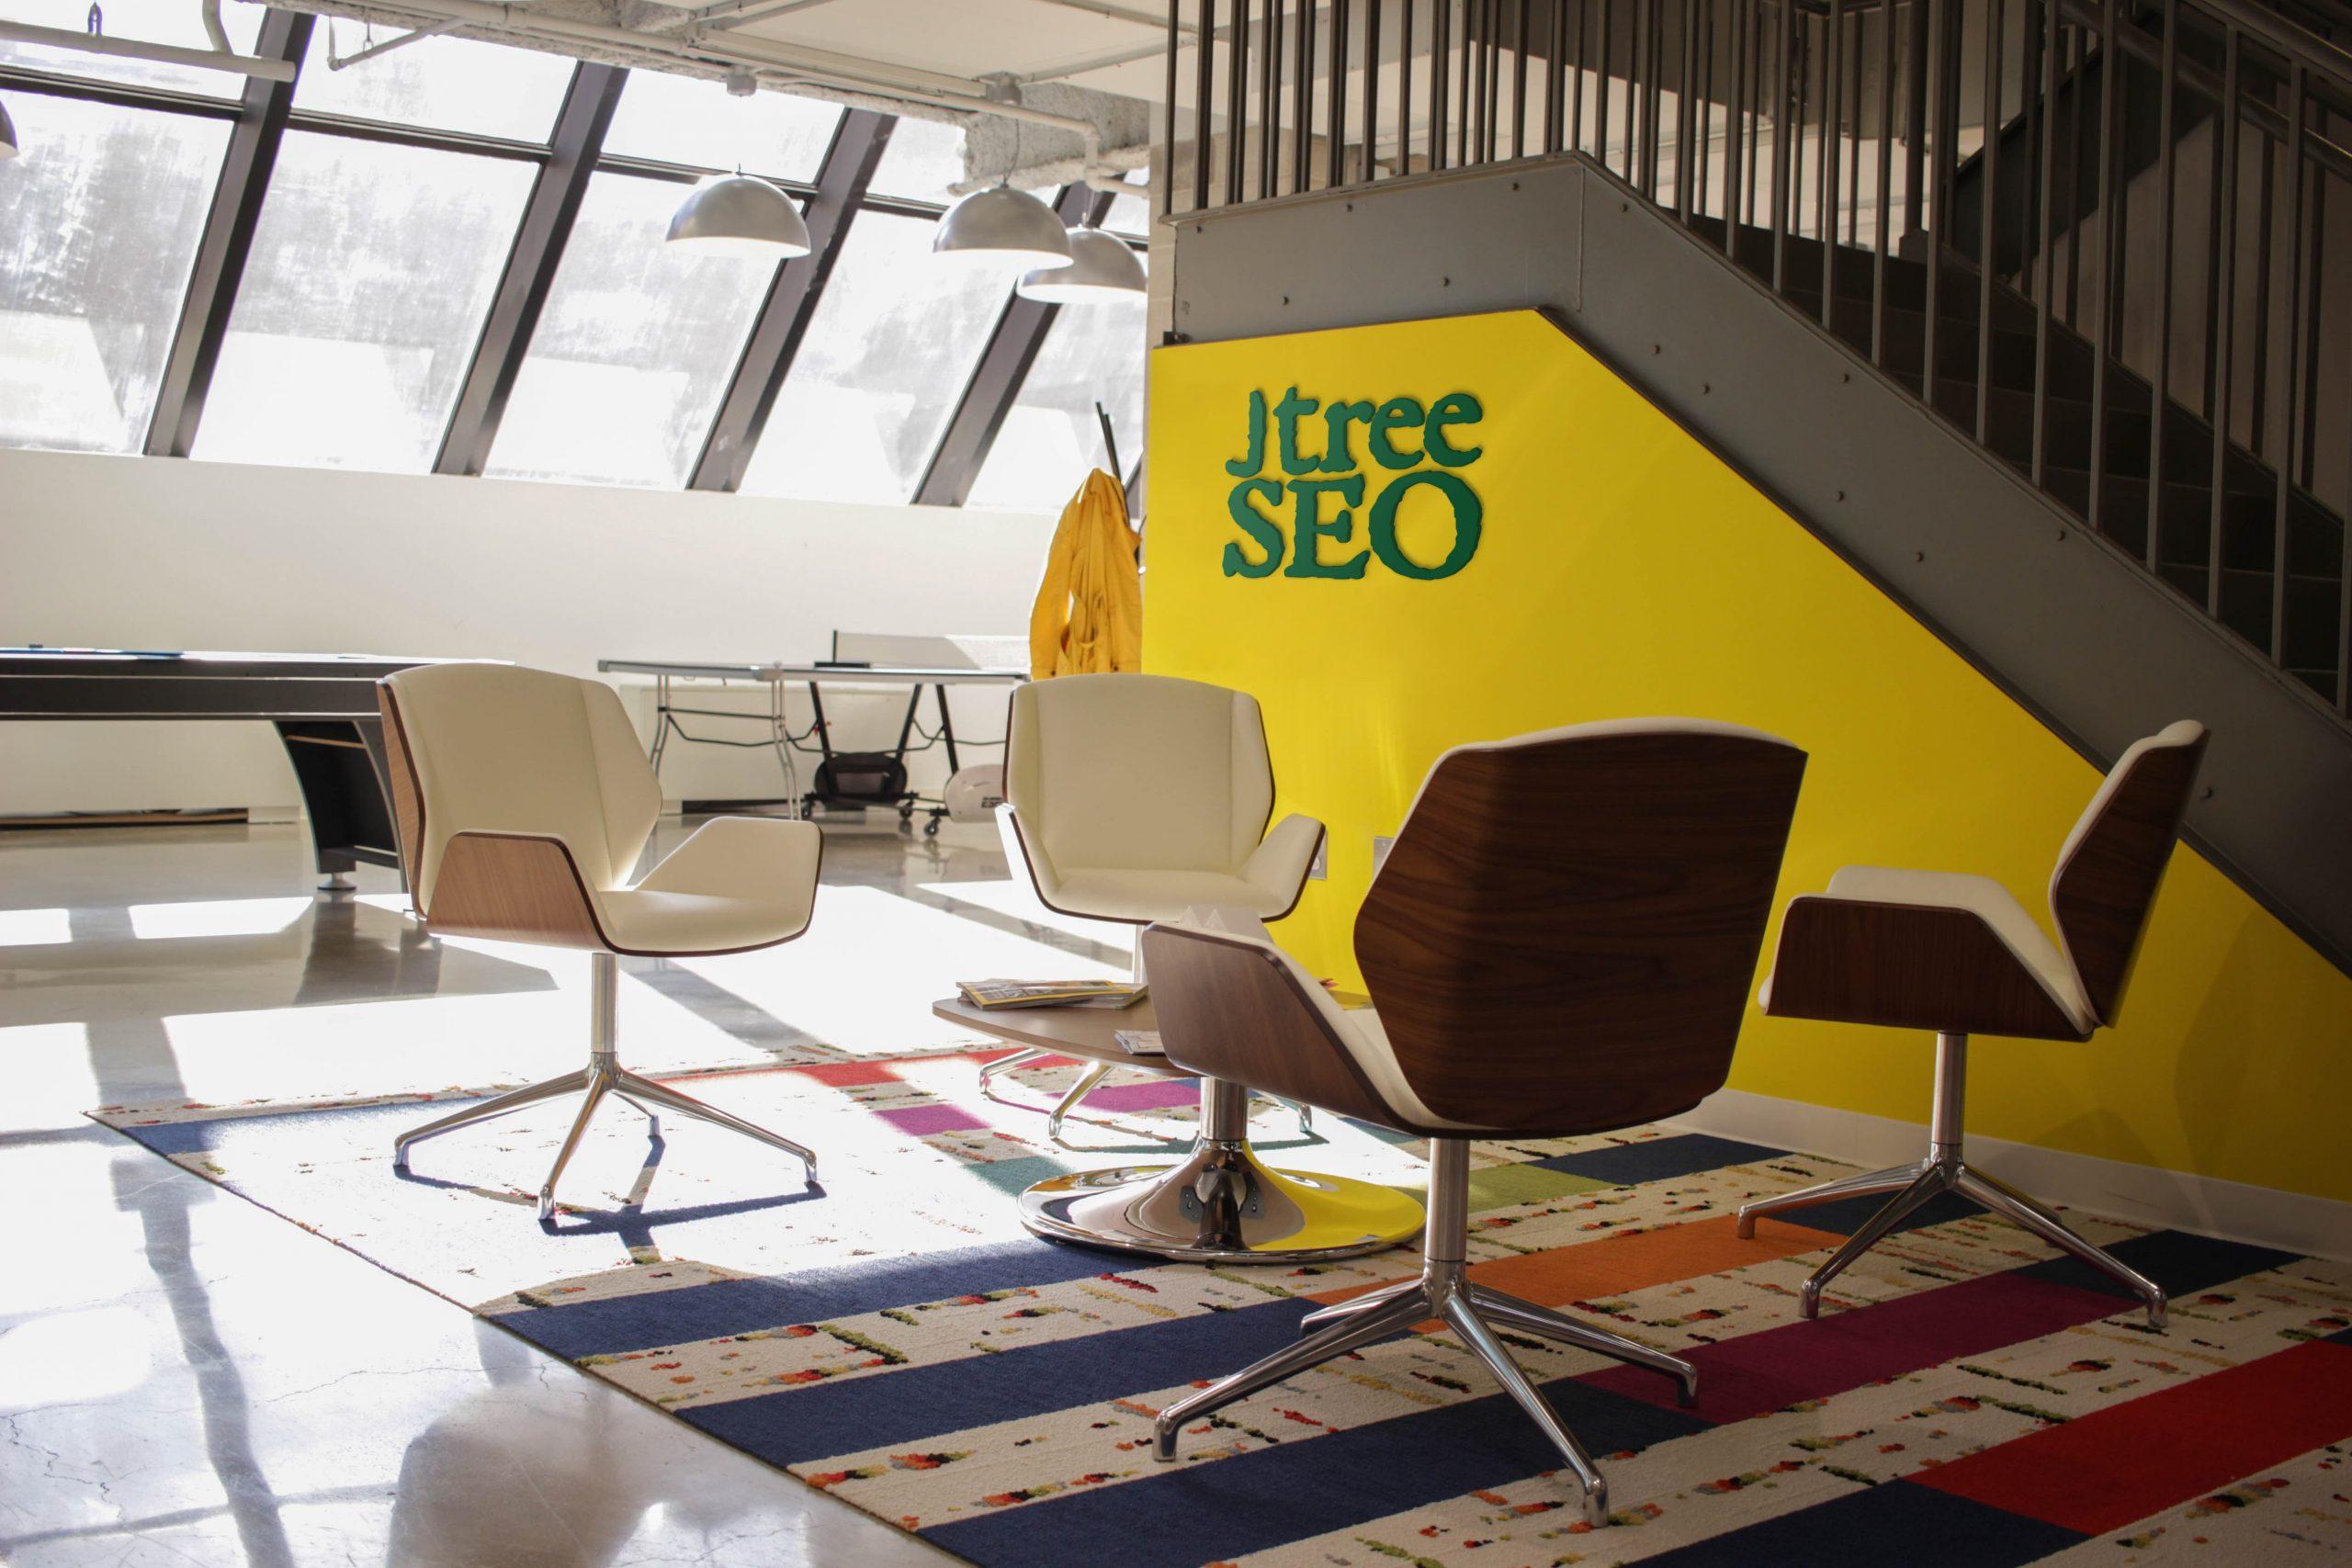 Jtree SEO Office